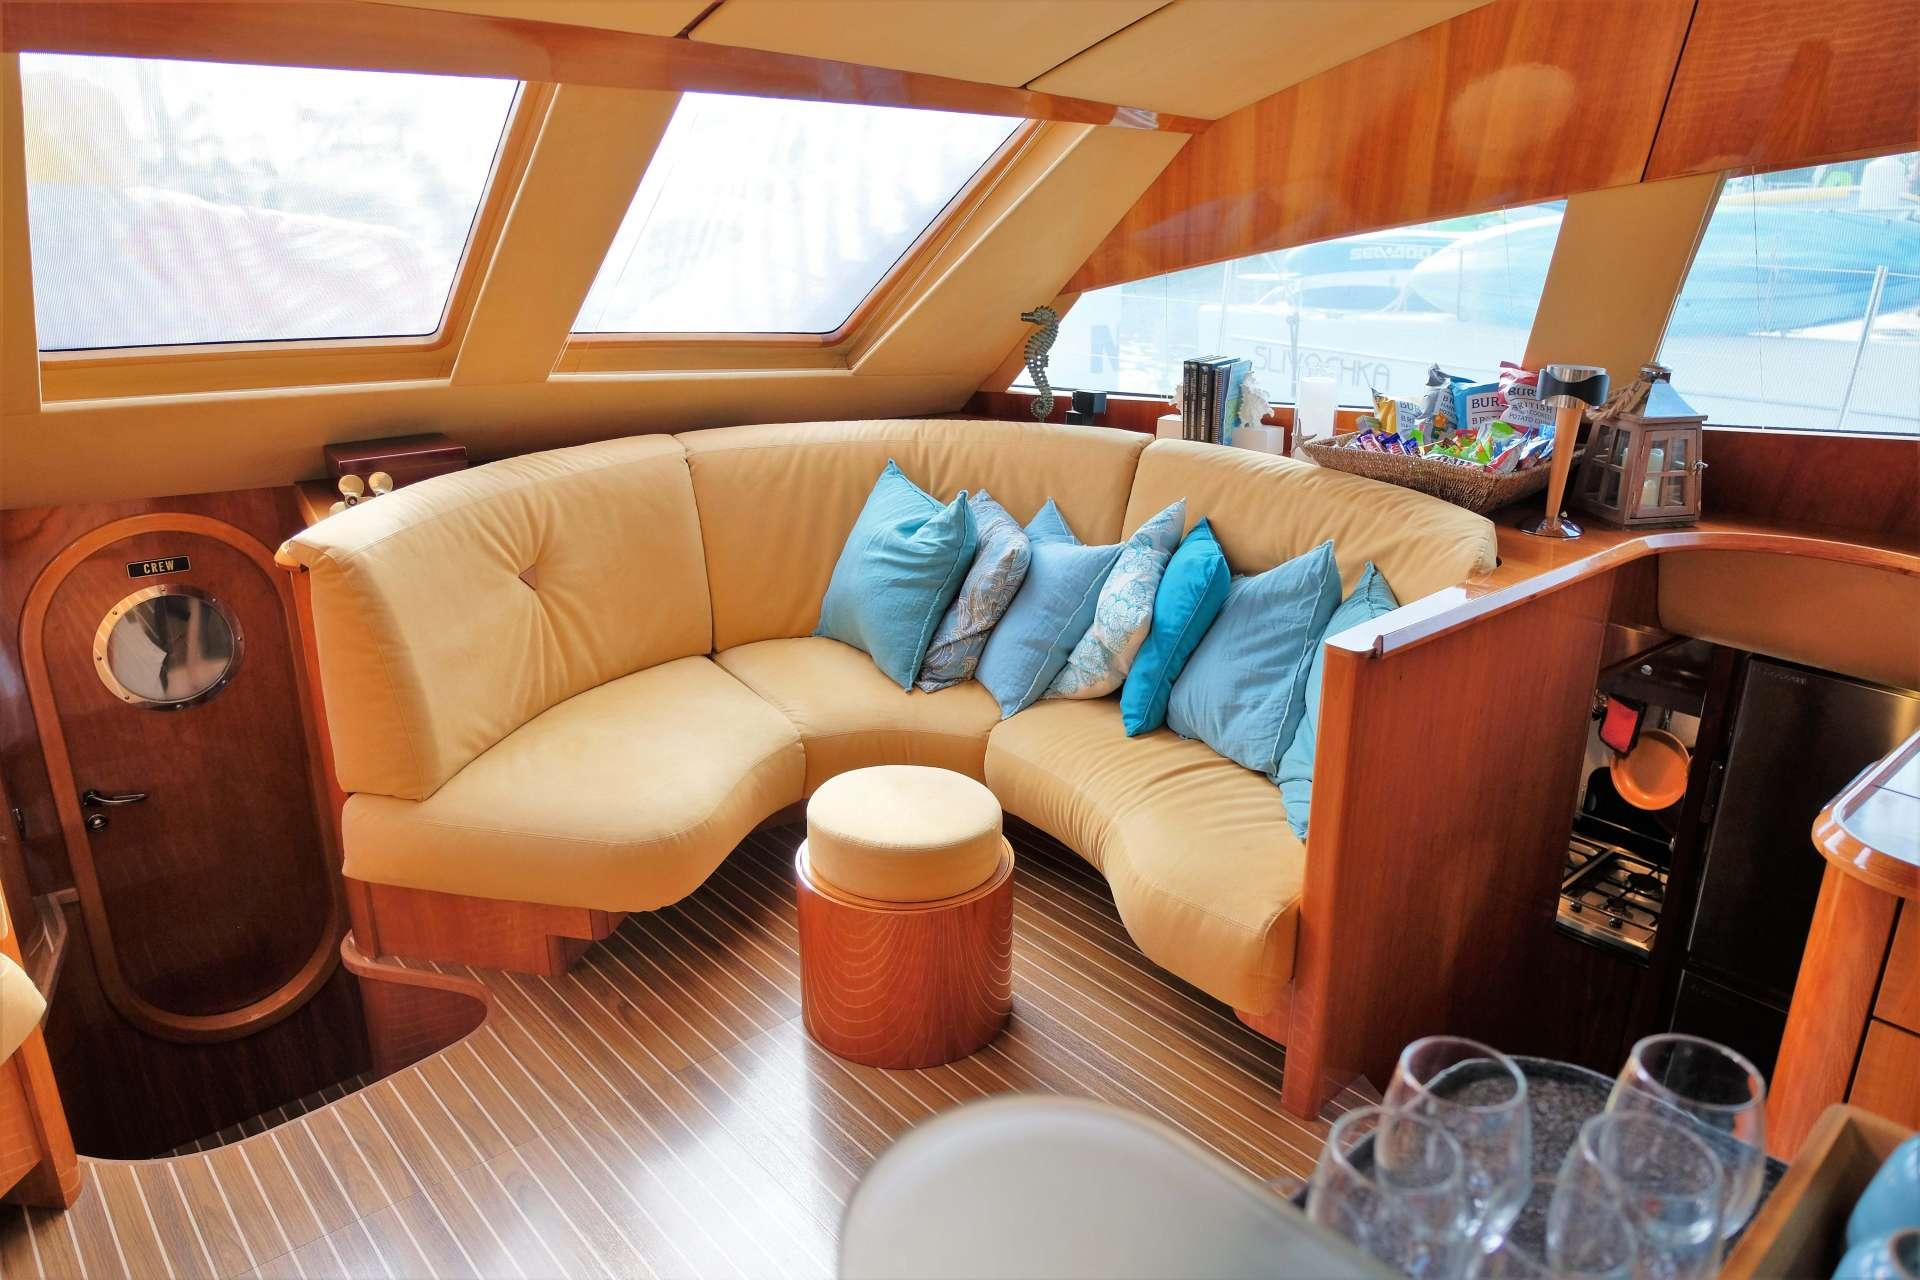 XENIA 62 yacht image # 2